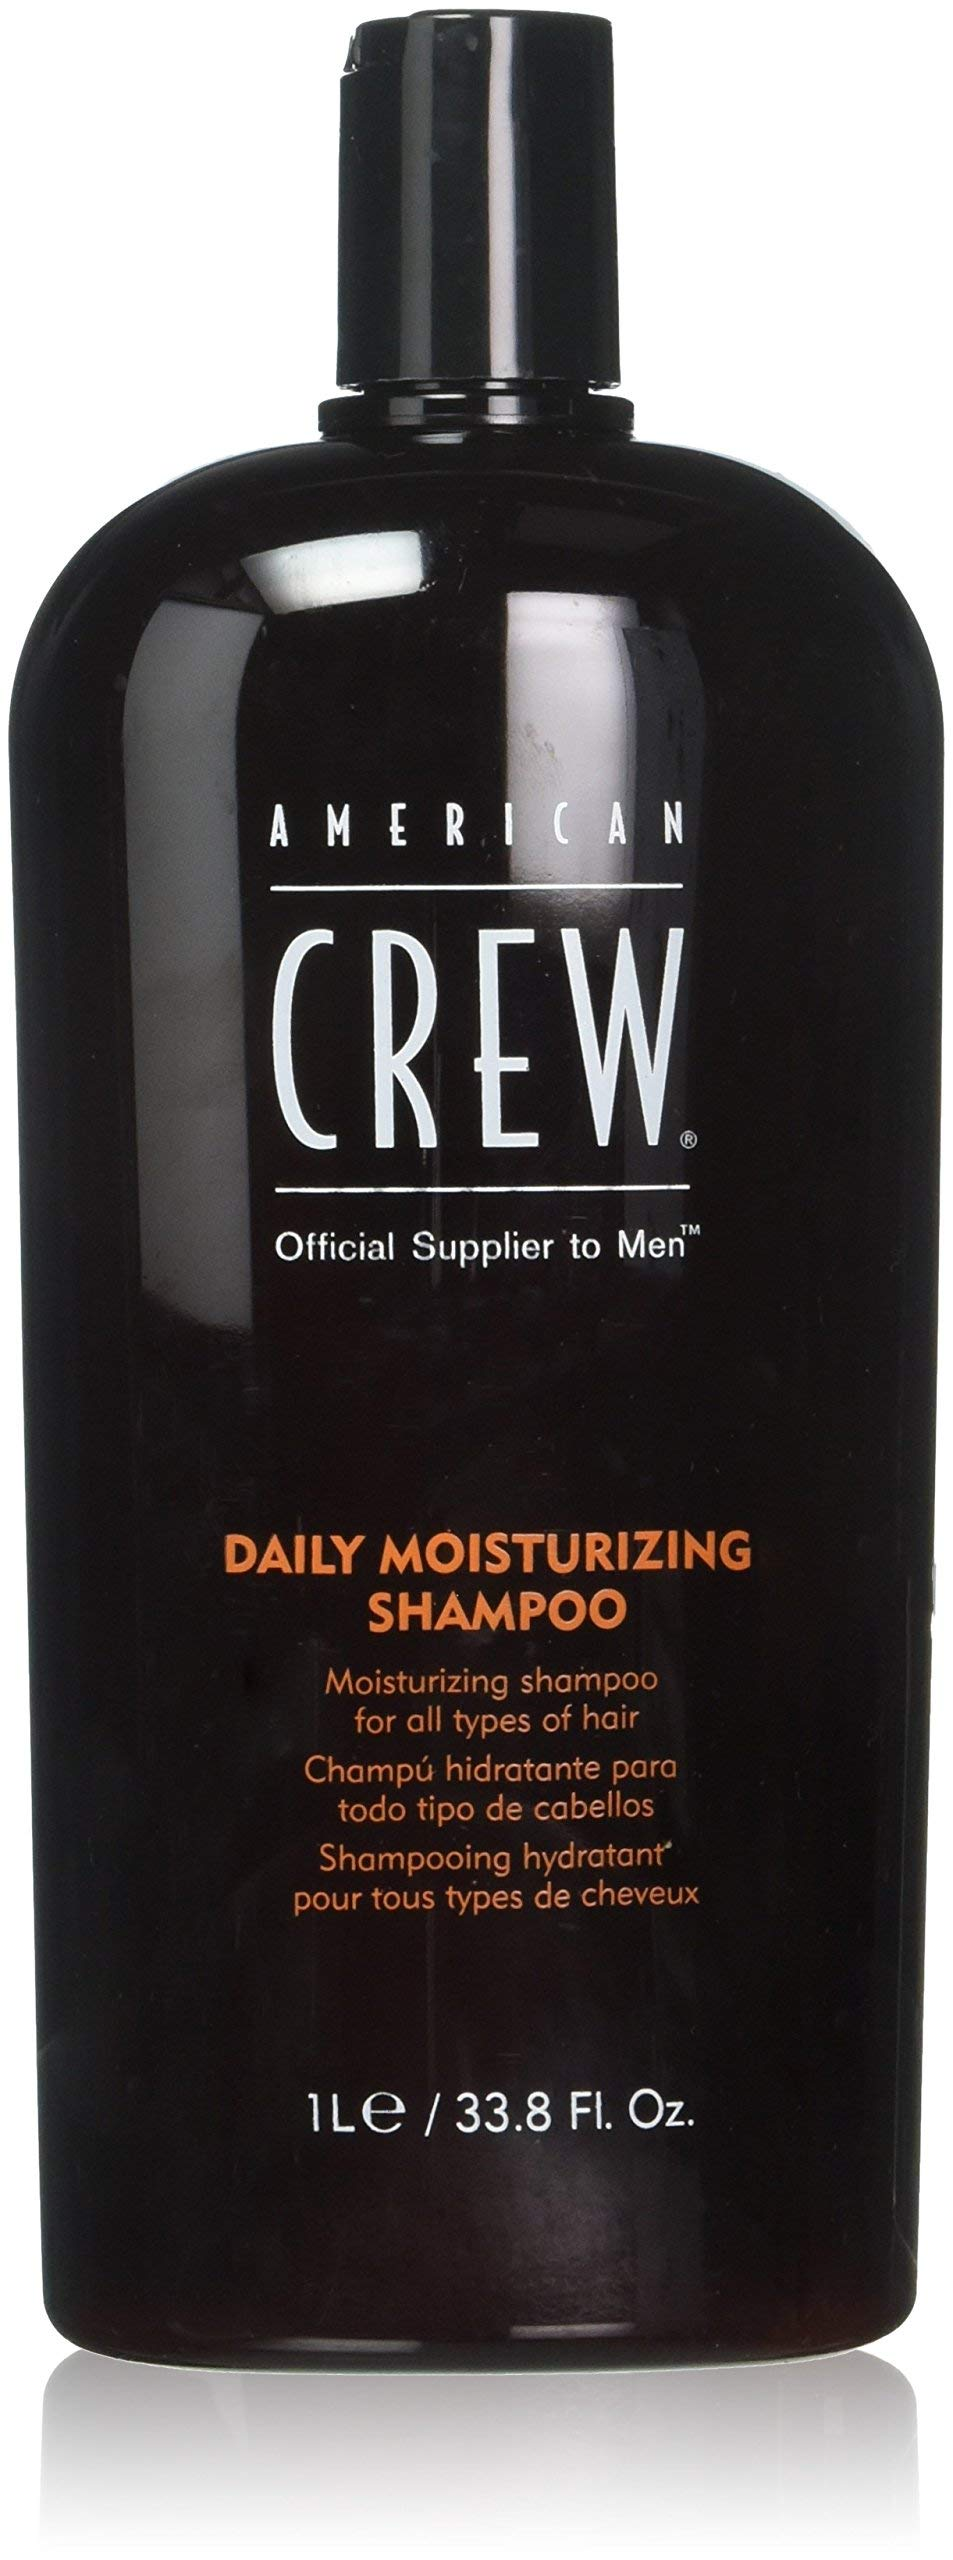 American Crew Daily Moisturizing Shampoo 33.8oz/1000ml